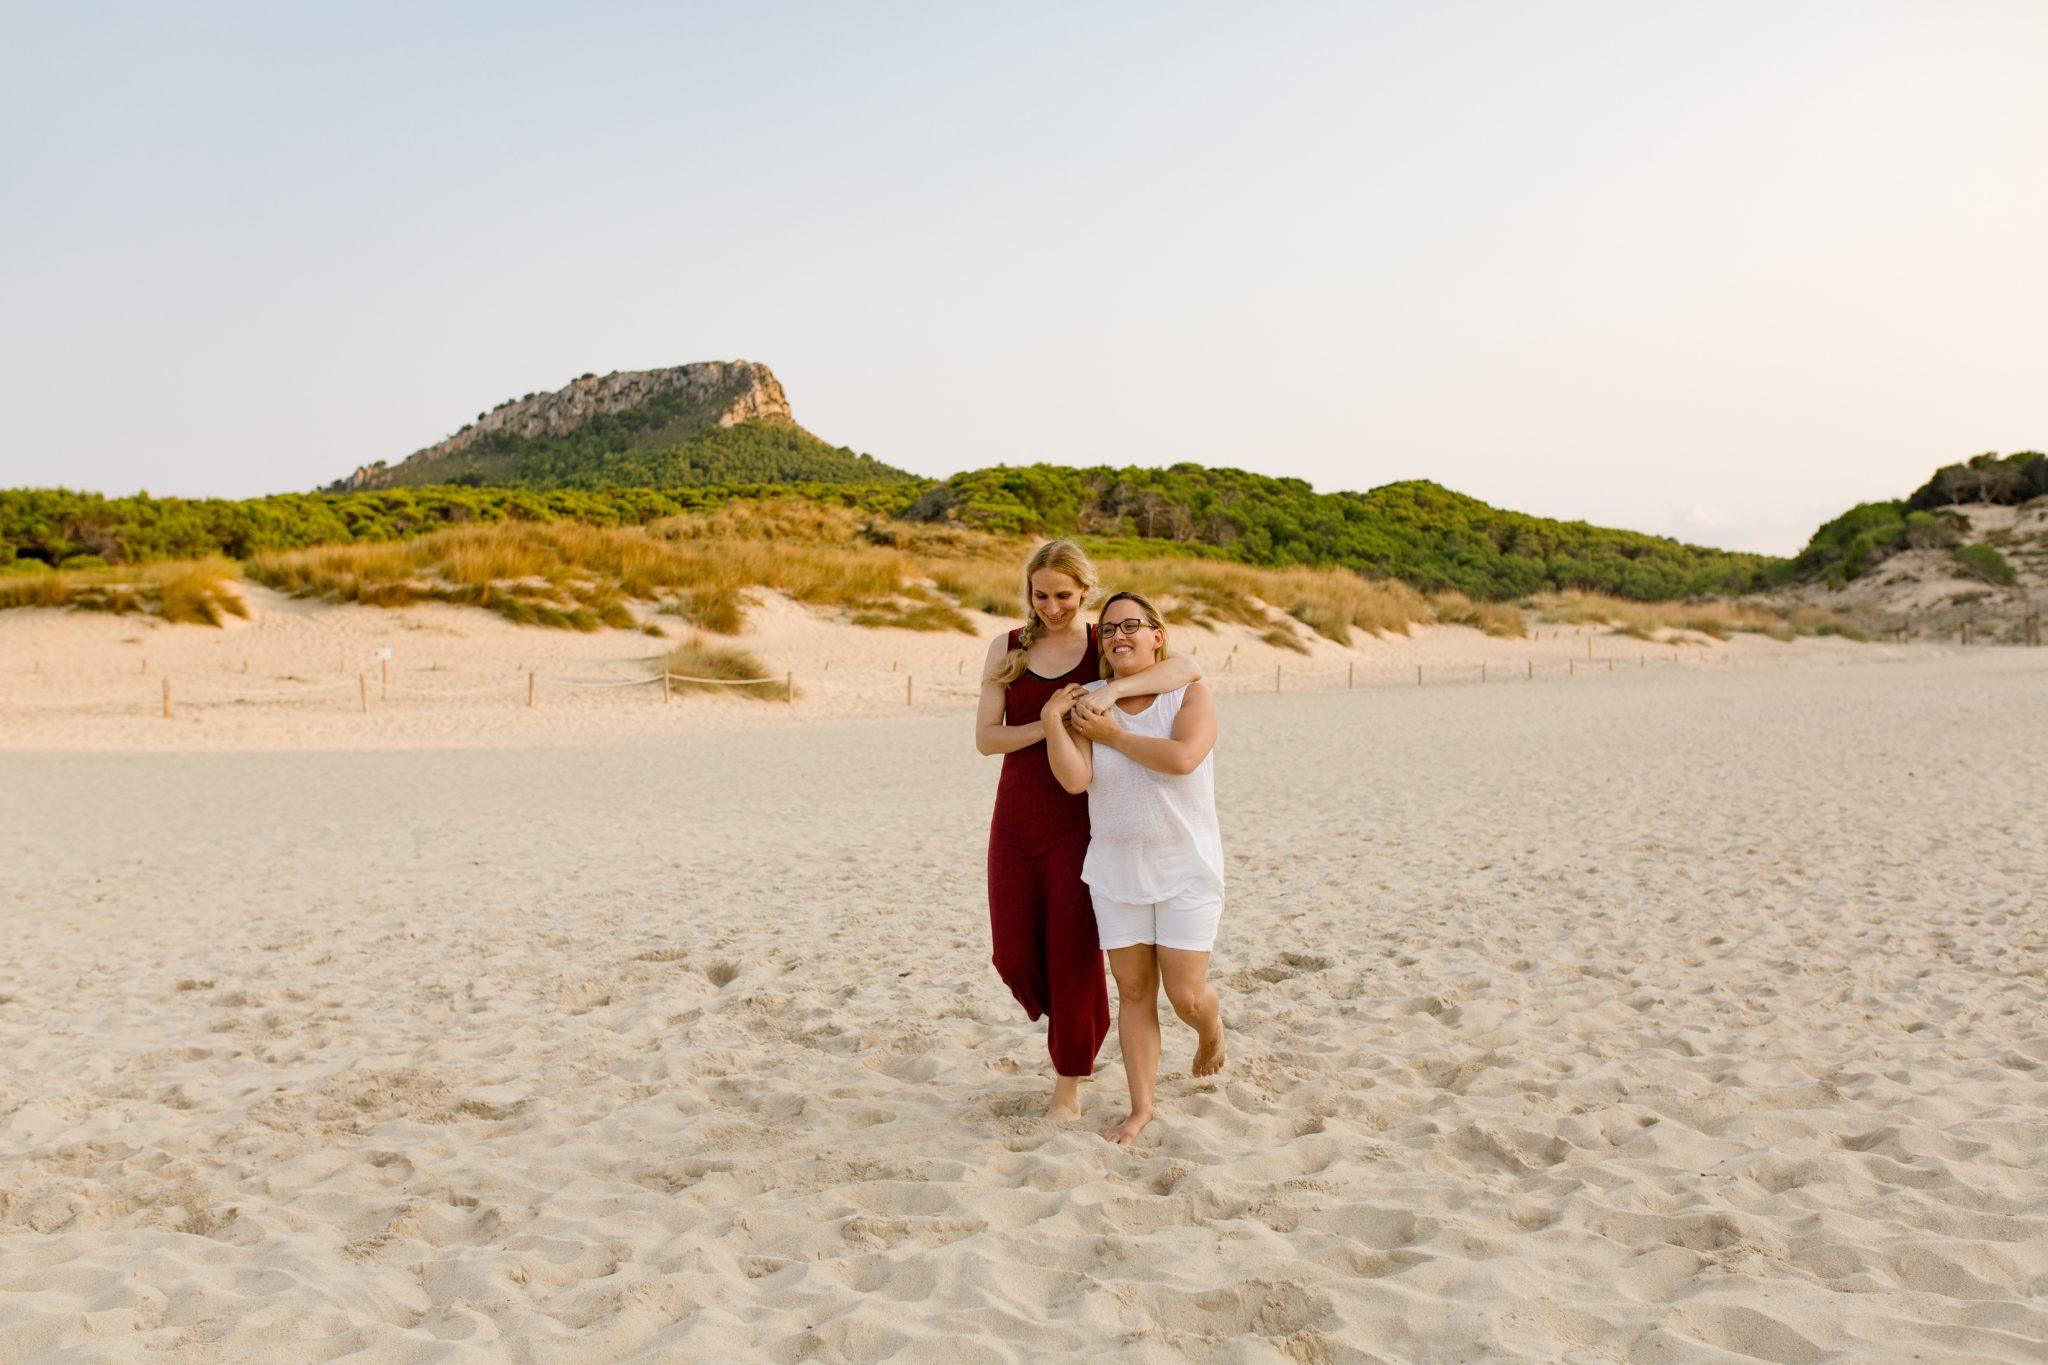 Linda honeymoon cala mesquida Mallorca 19